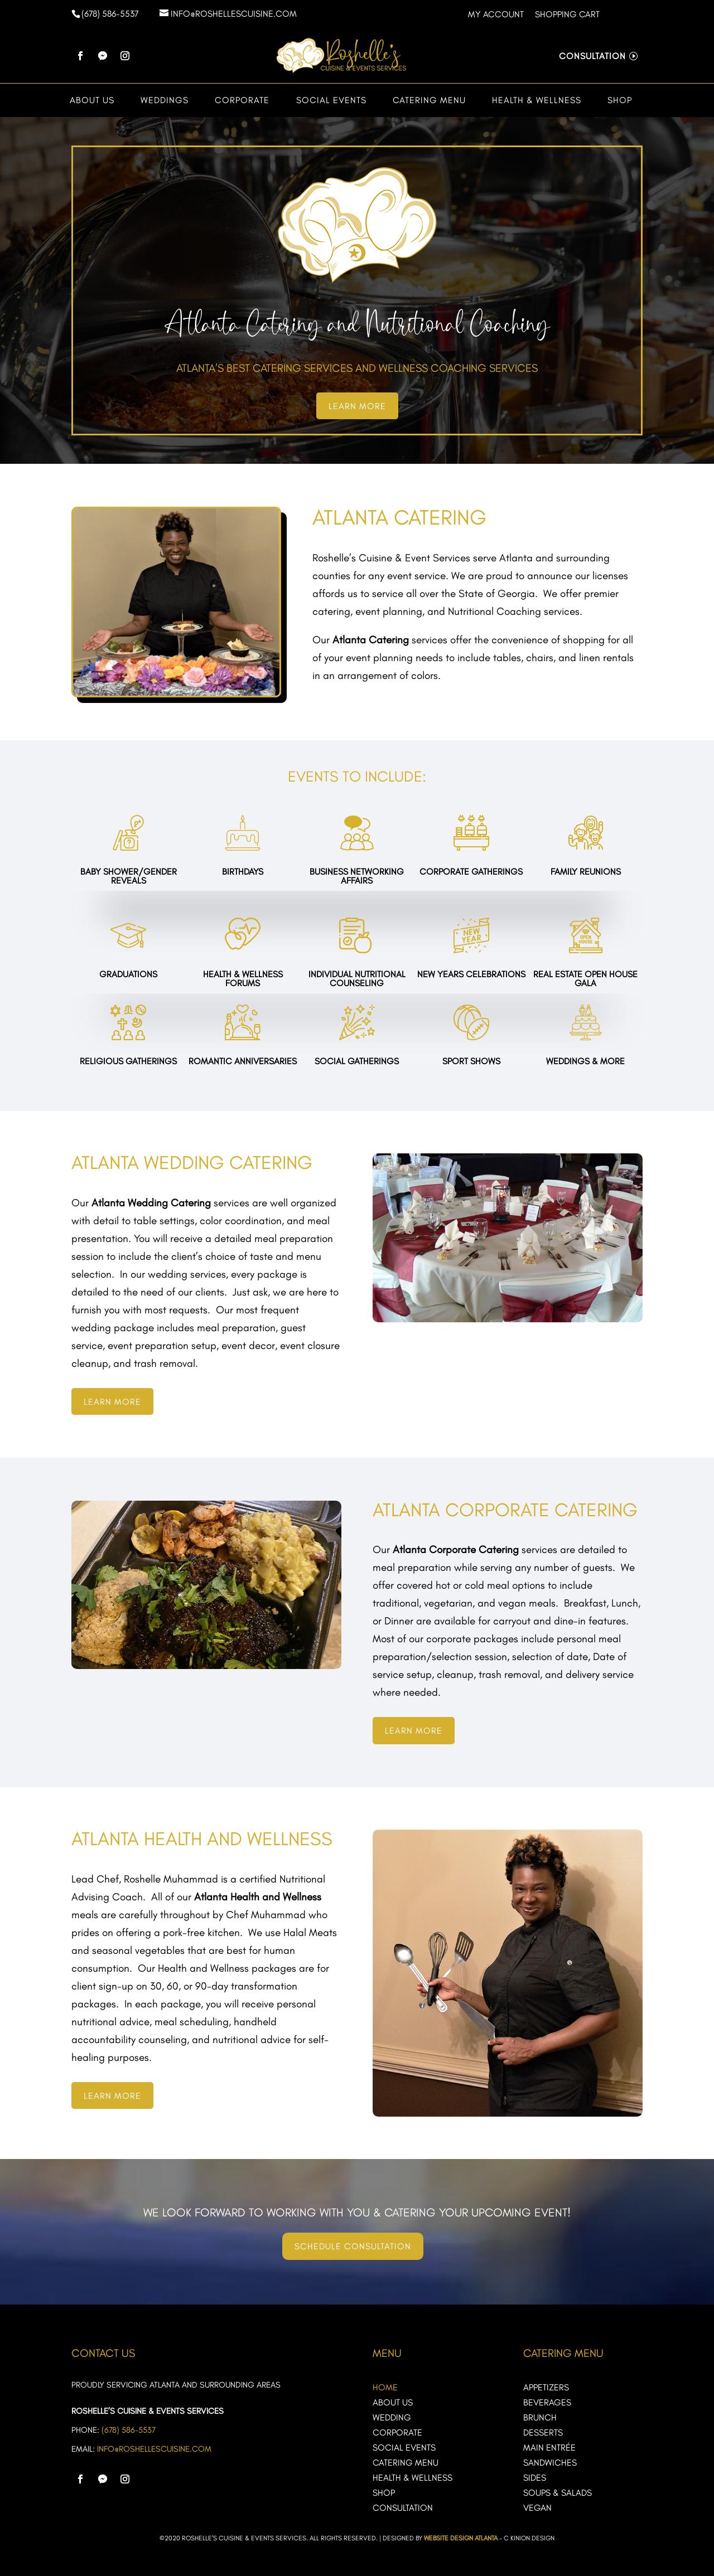 Birmingham-Web-Design-Agency-C-Kinion-Design- Roshelle's Cuisine & Events Servcies - Full page - 12.30.20